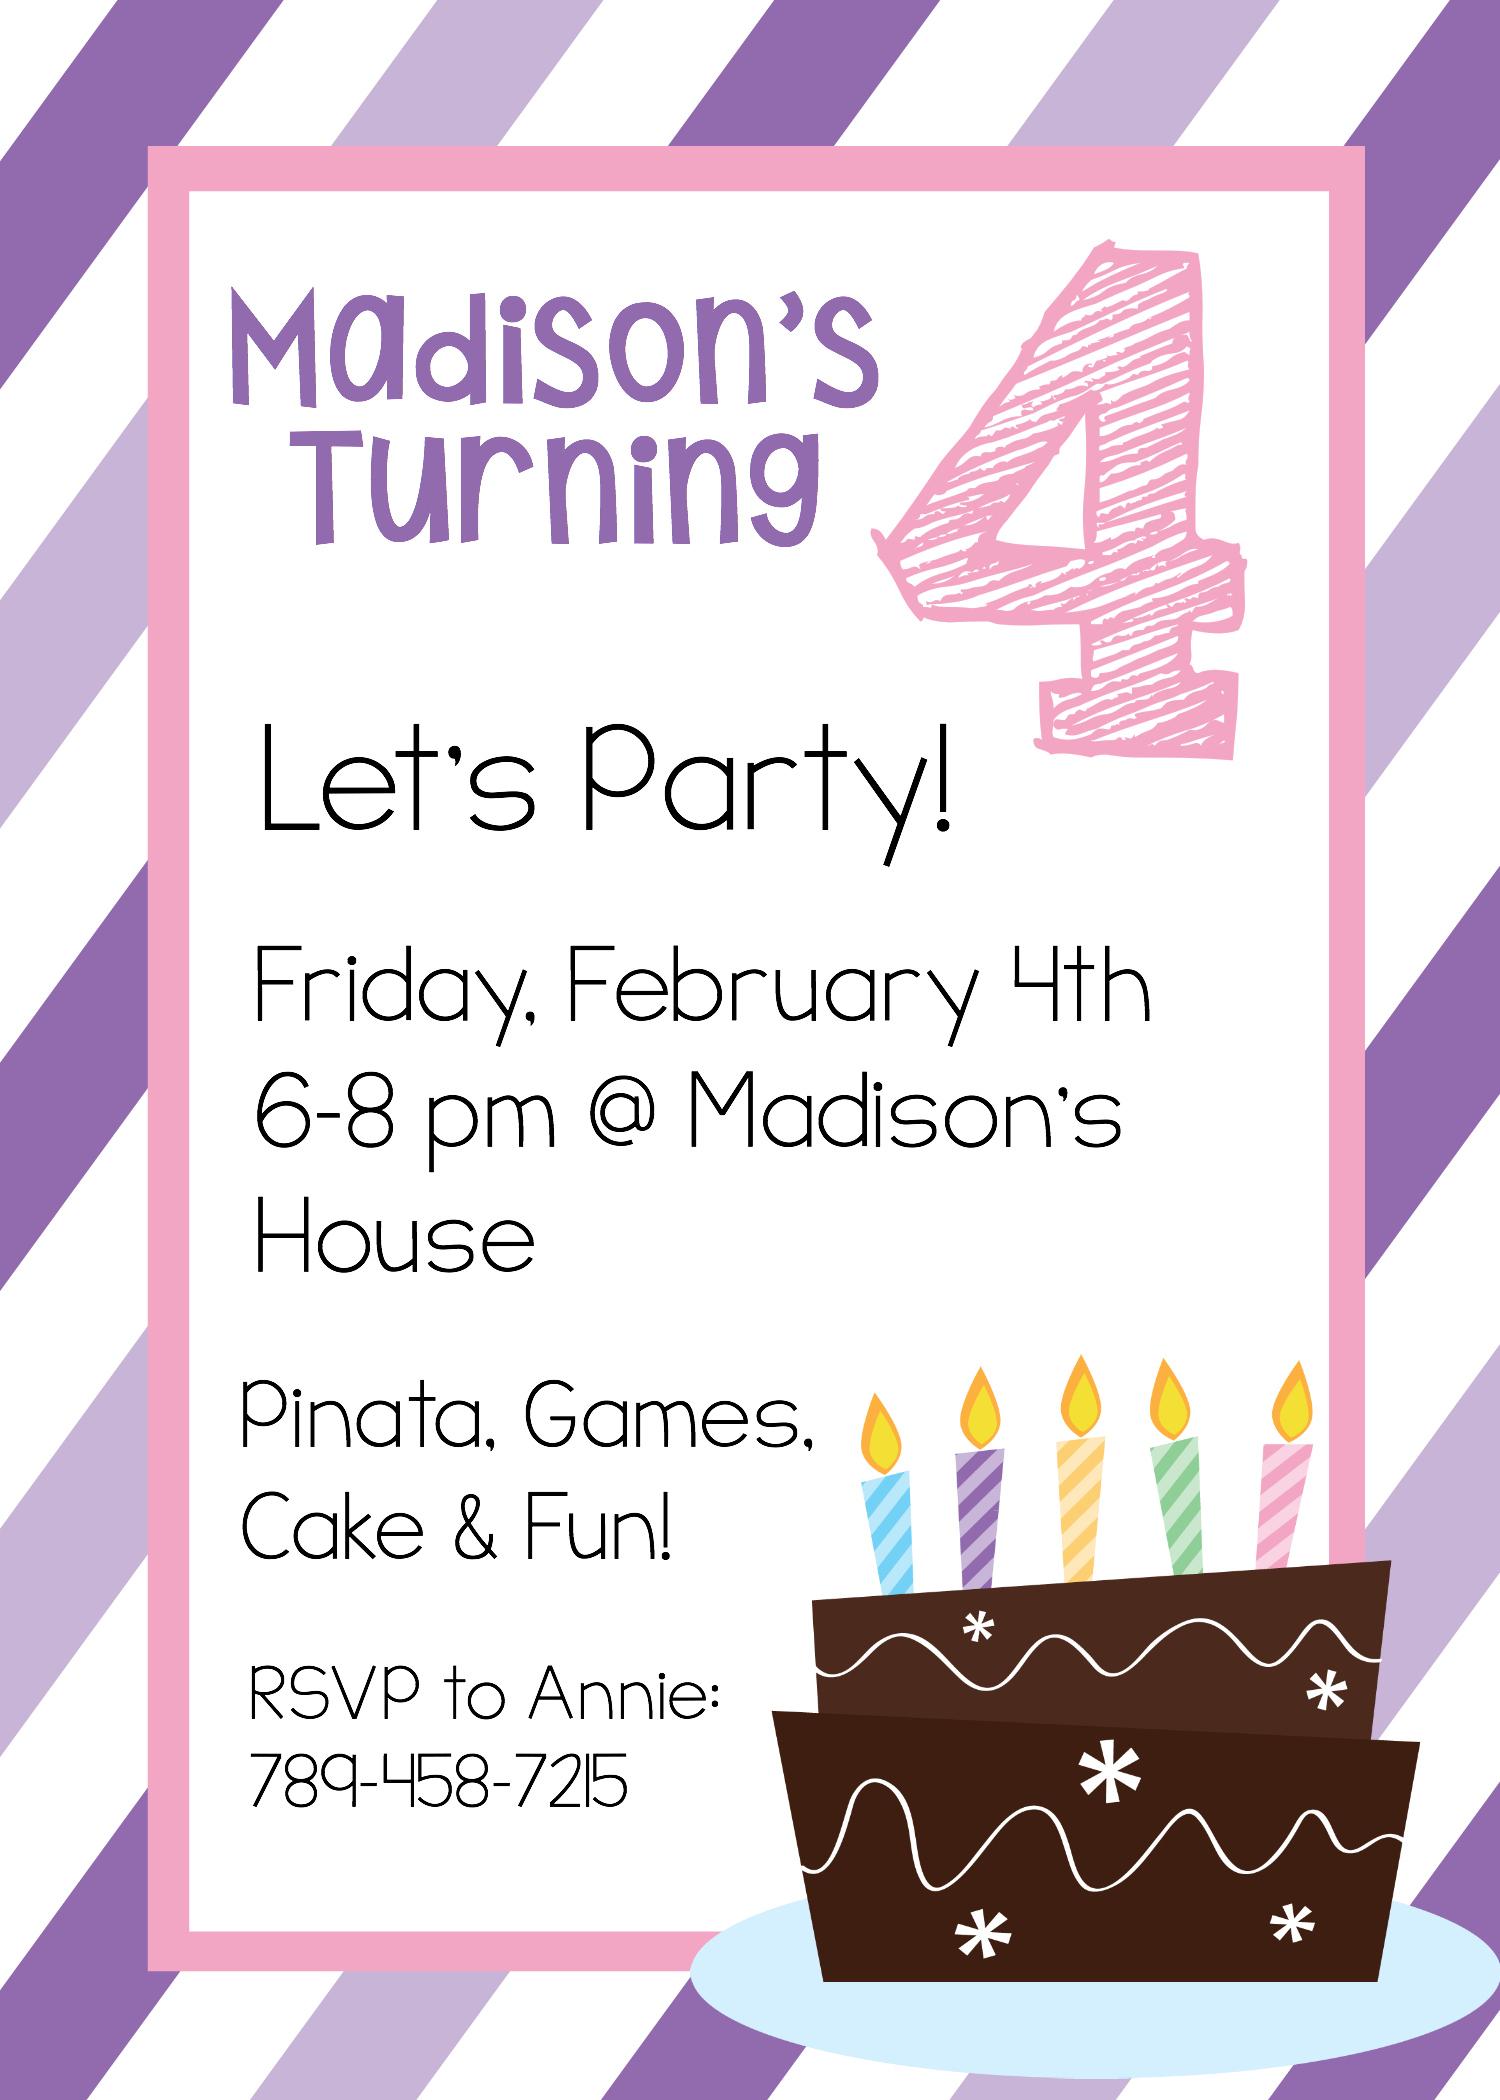 Free Printable Birthday Invitation Templates - Free Printable Birthday Invitations With Pictures